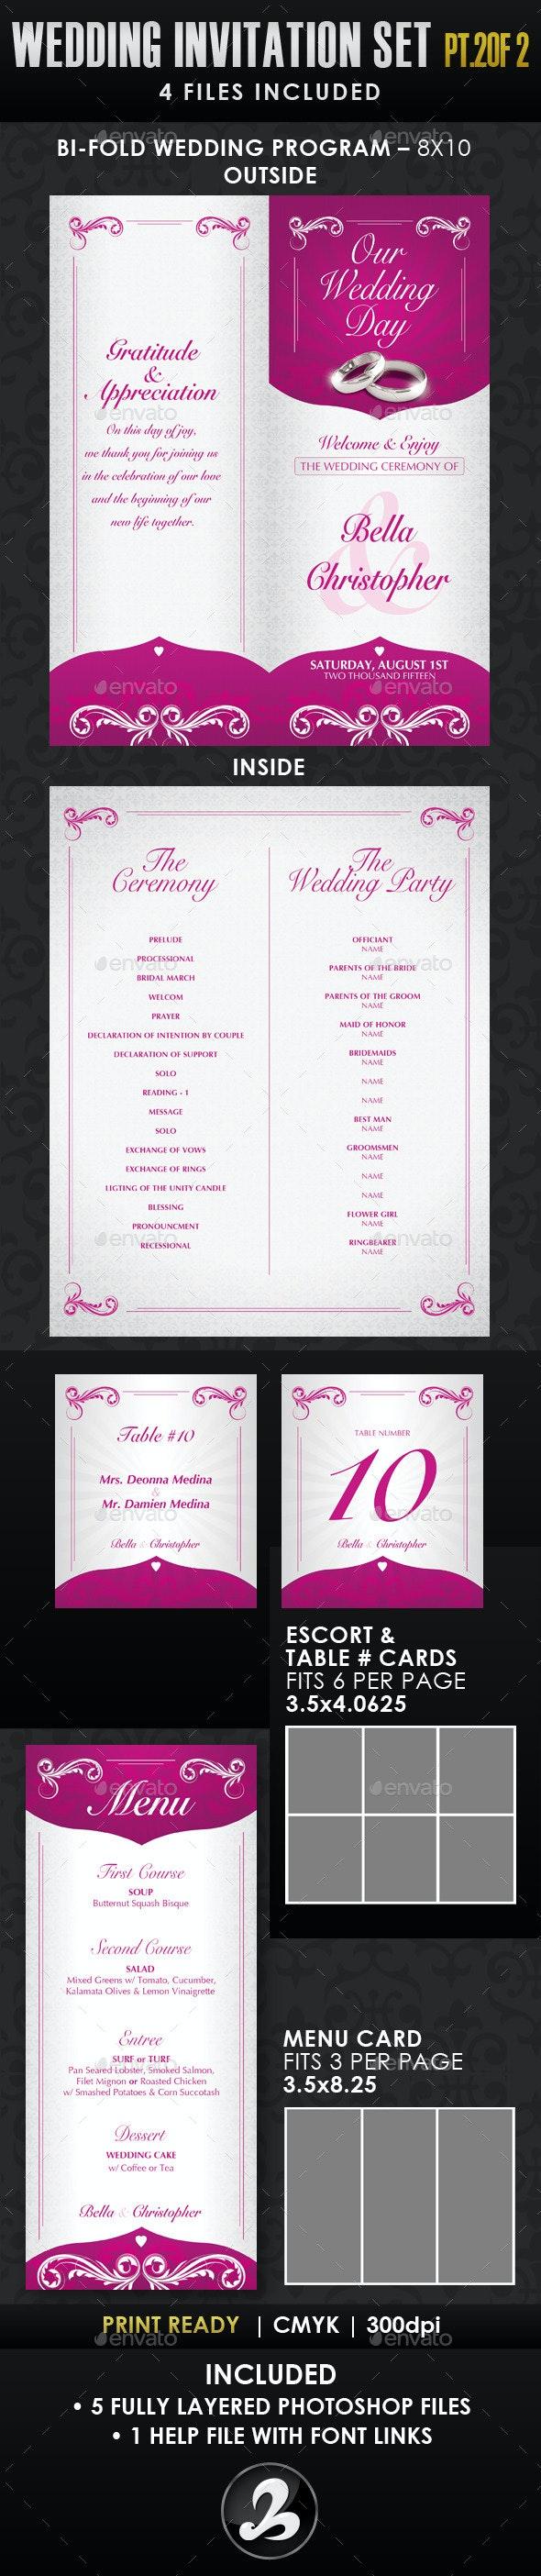 Wedding Invitation Template Set - Vol.1b - Weddings Cards & Invites